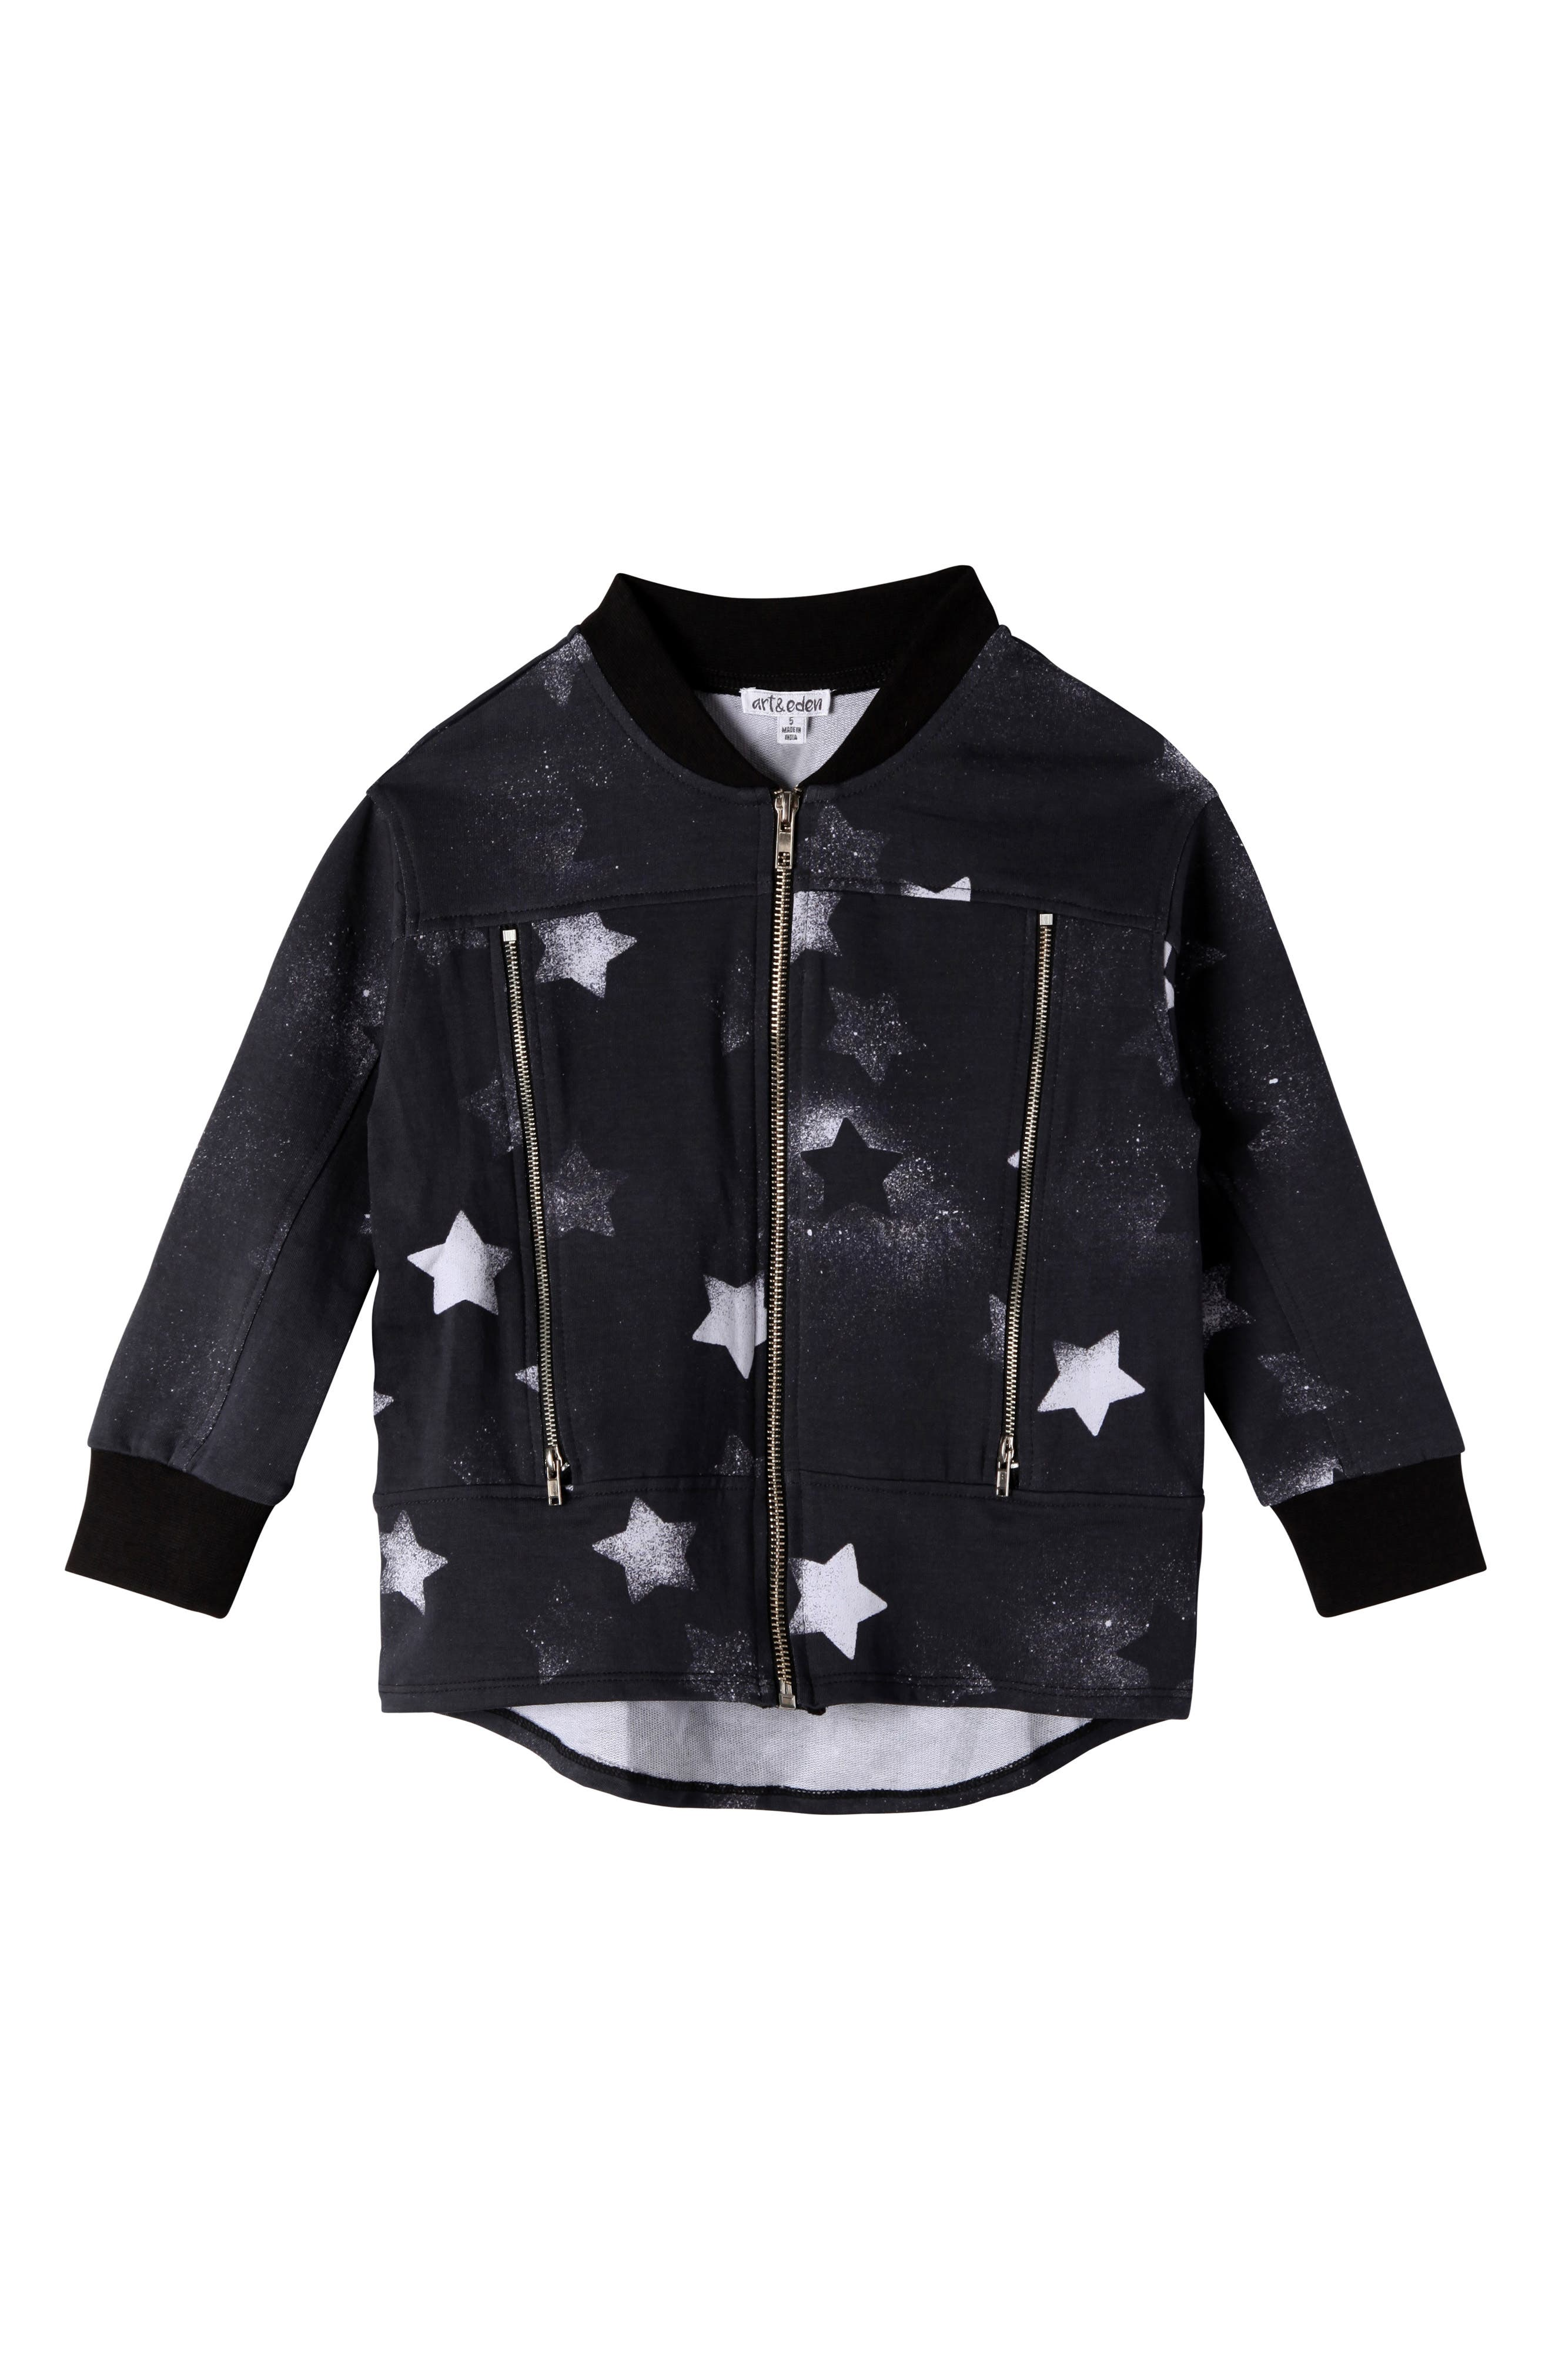 ART & EDEN Camilla Star Print Bomber Jacket